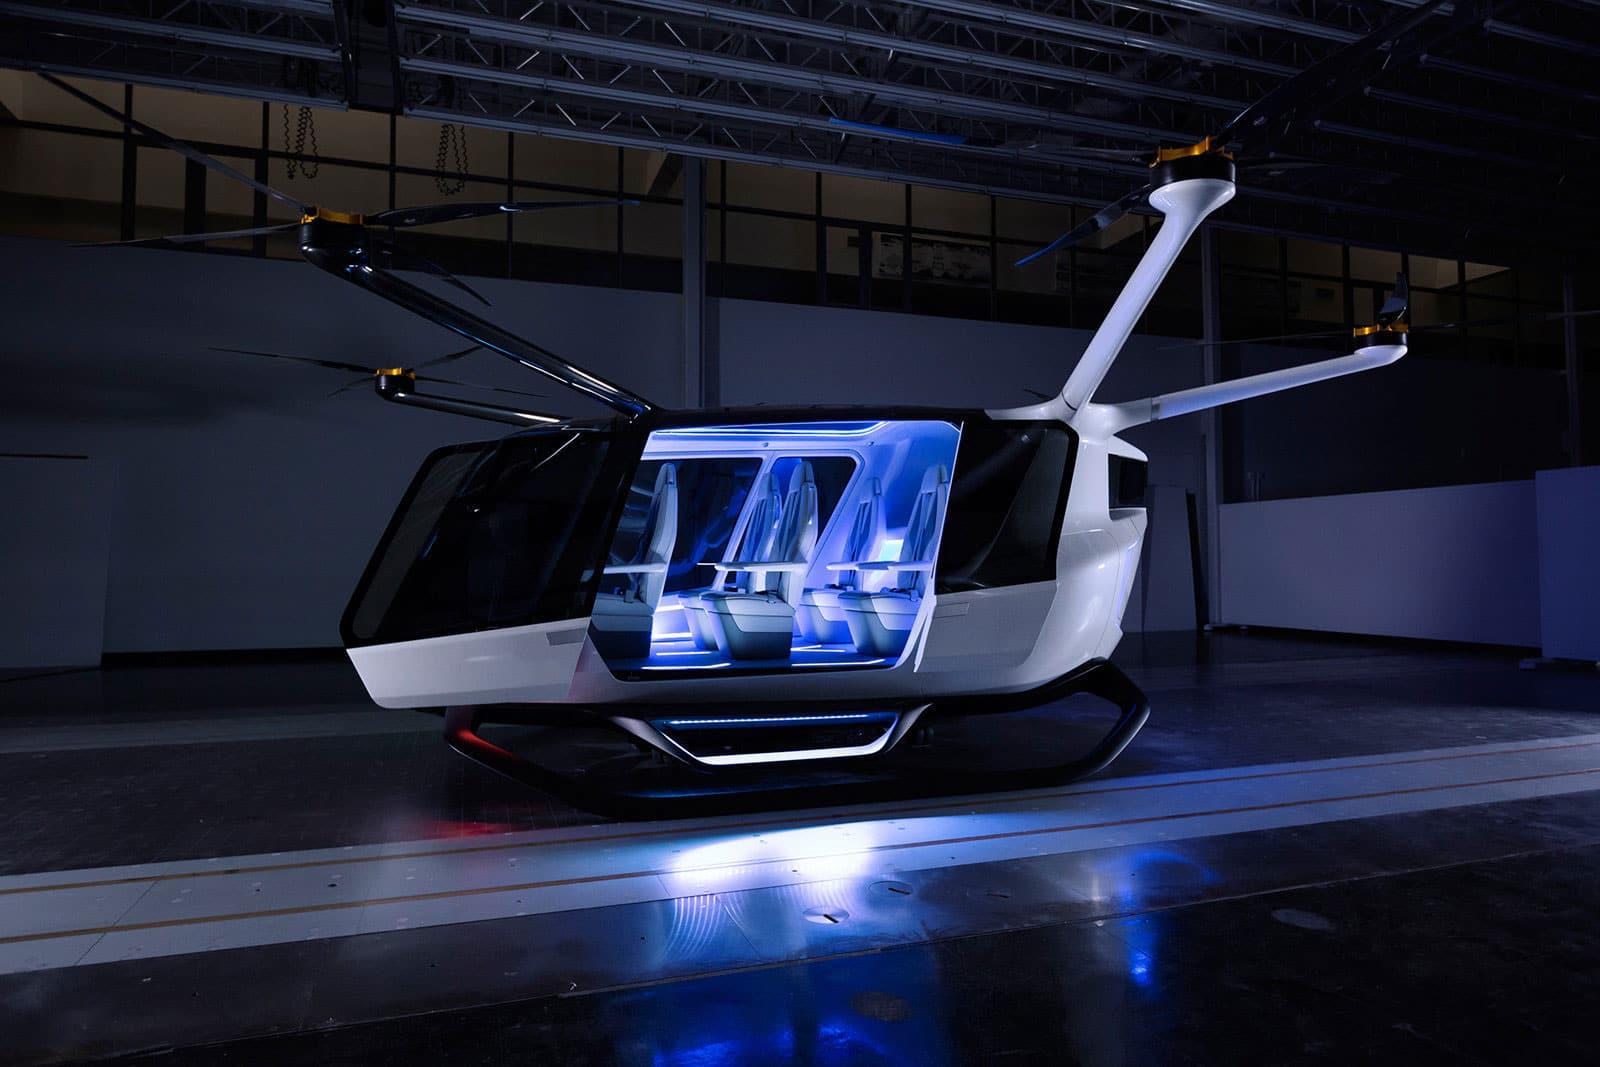 Alaka'i Technologies